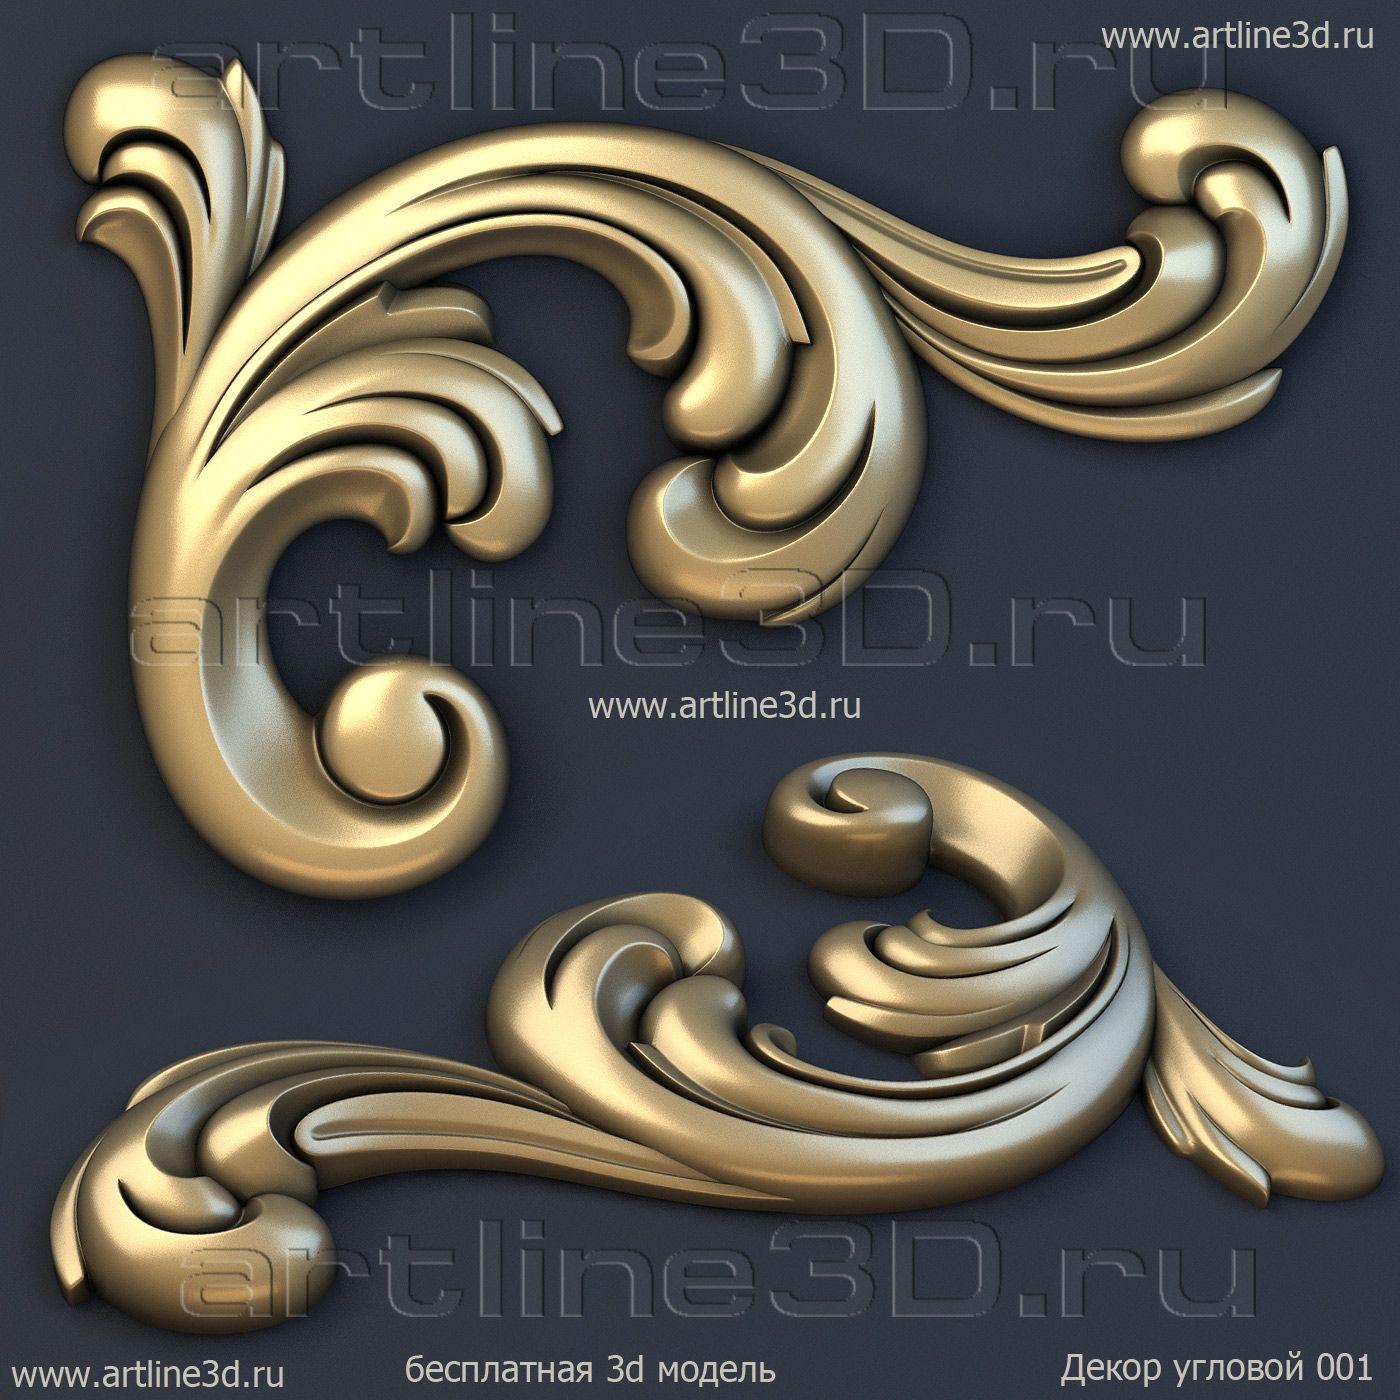 Материалы для декоративных балок - АБС-техно: лестницы